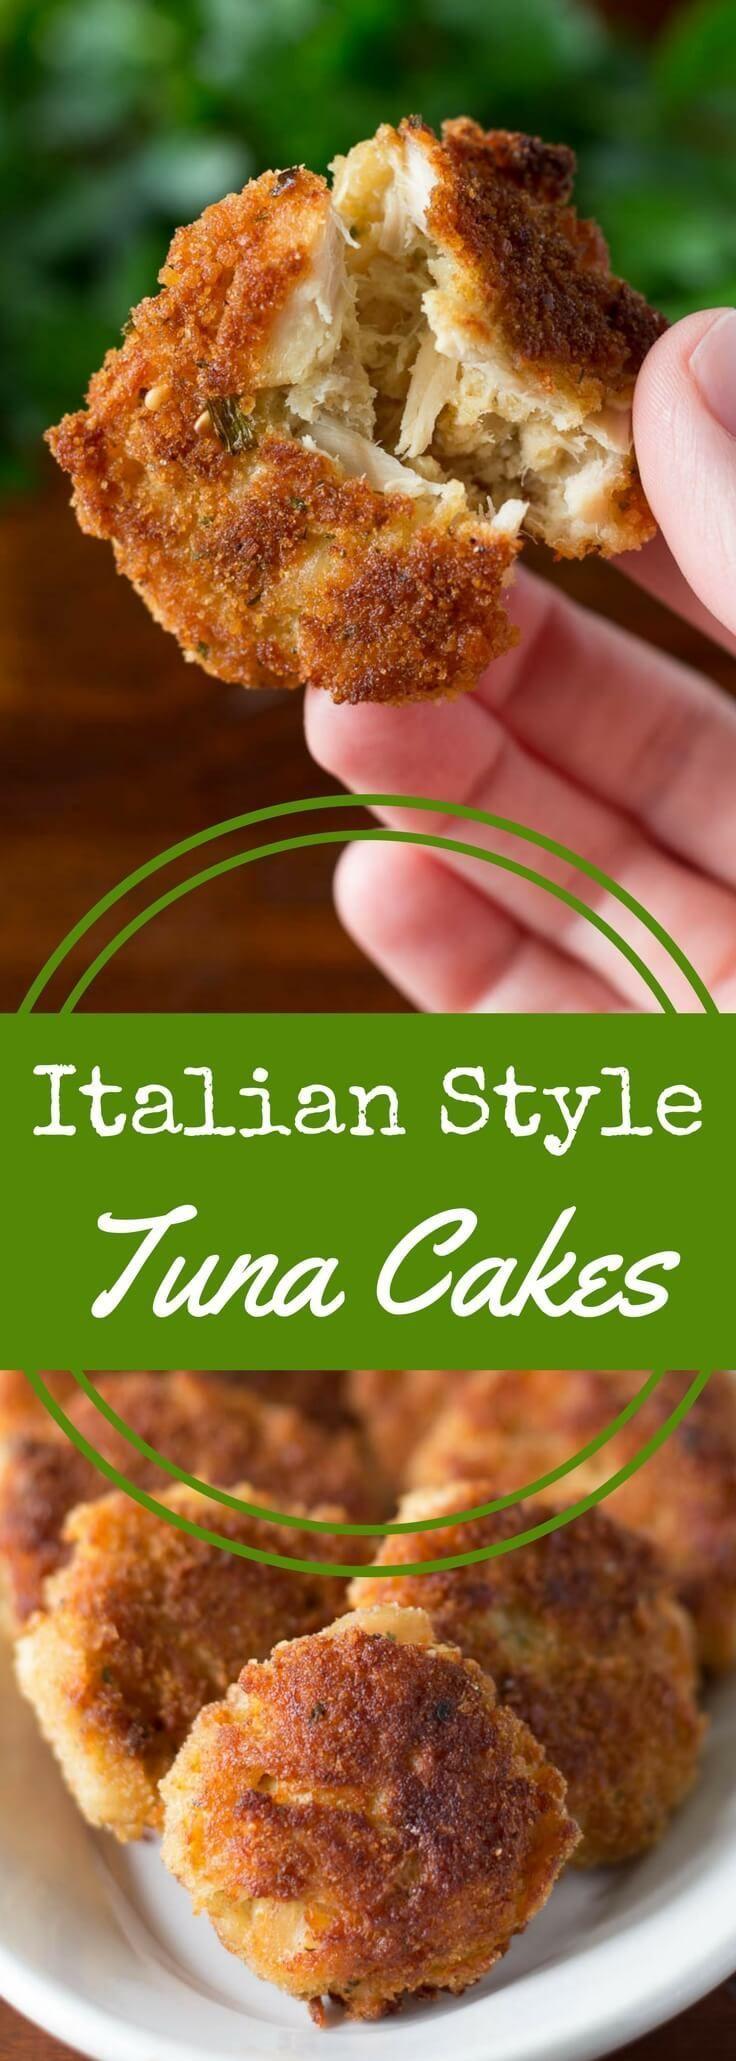 Italian-style Tuna Cakes